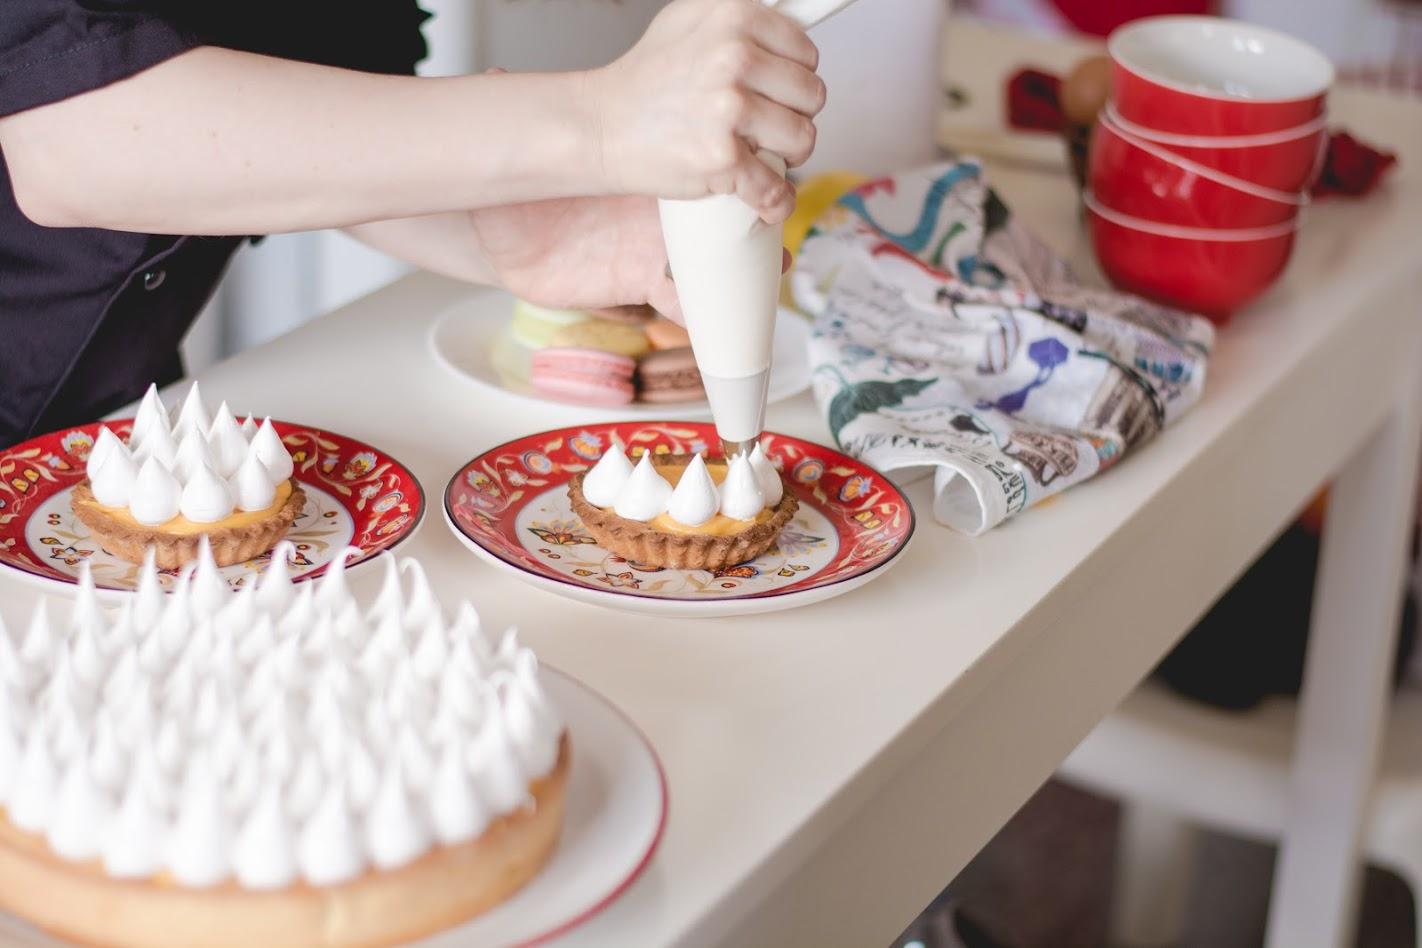 7-sugar-free-desserts.jpg